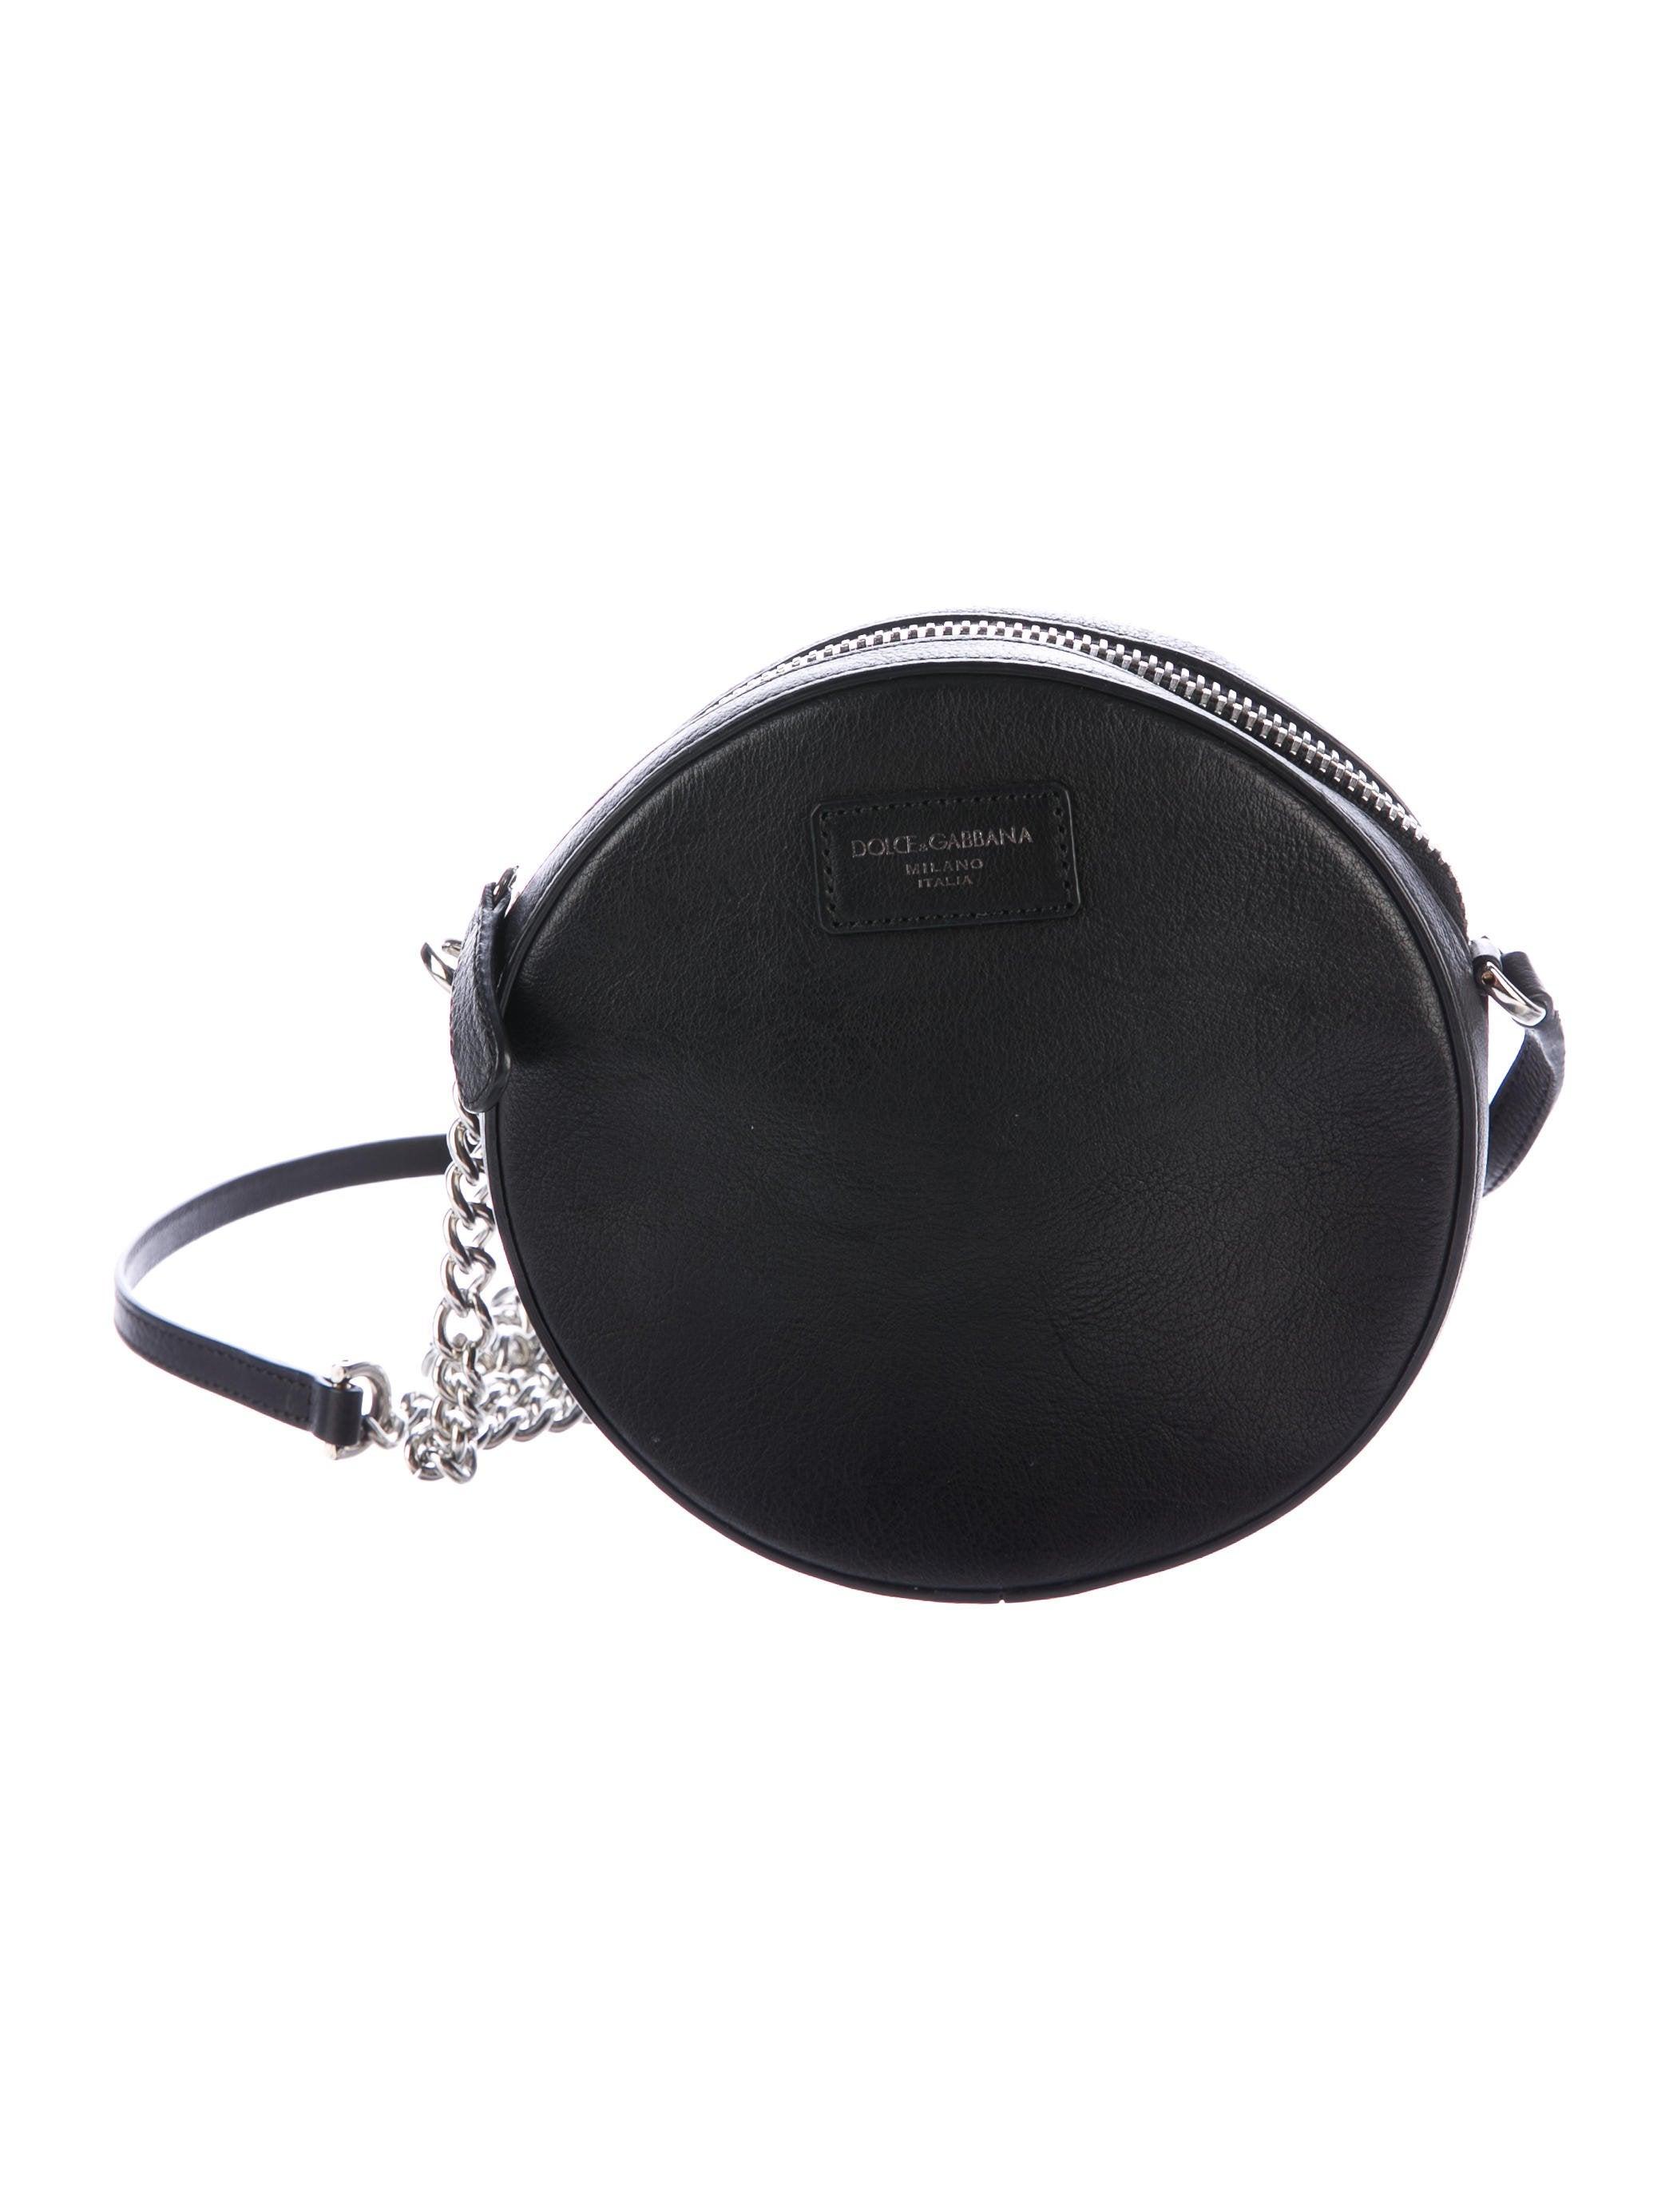 97829bbc6bcc Dolce   Gabbana Round Sling Bag - Handbags - DAG89049